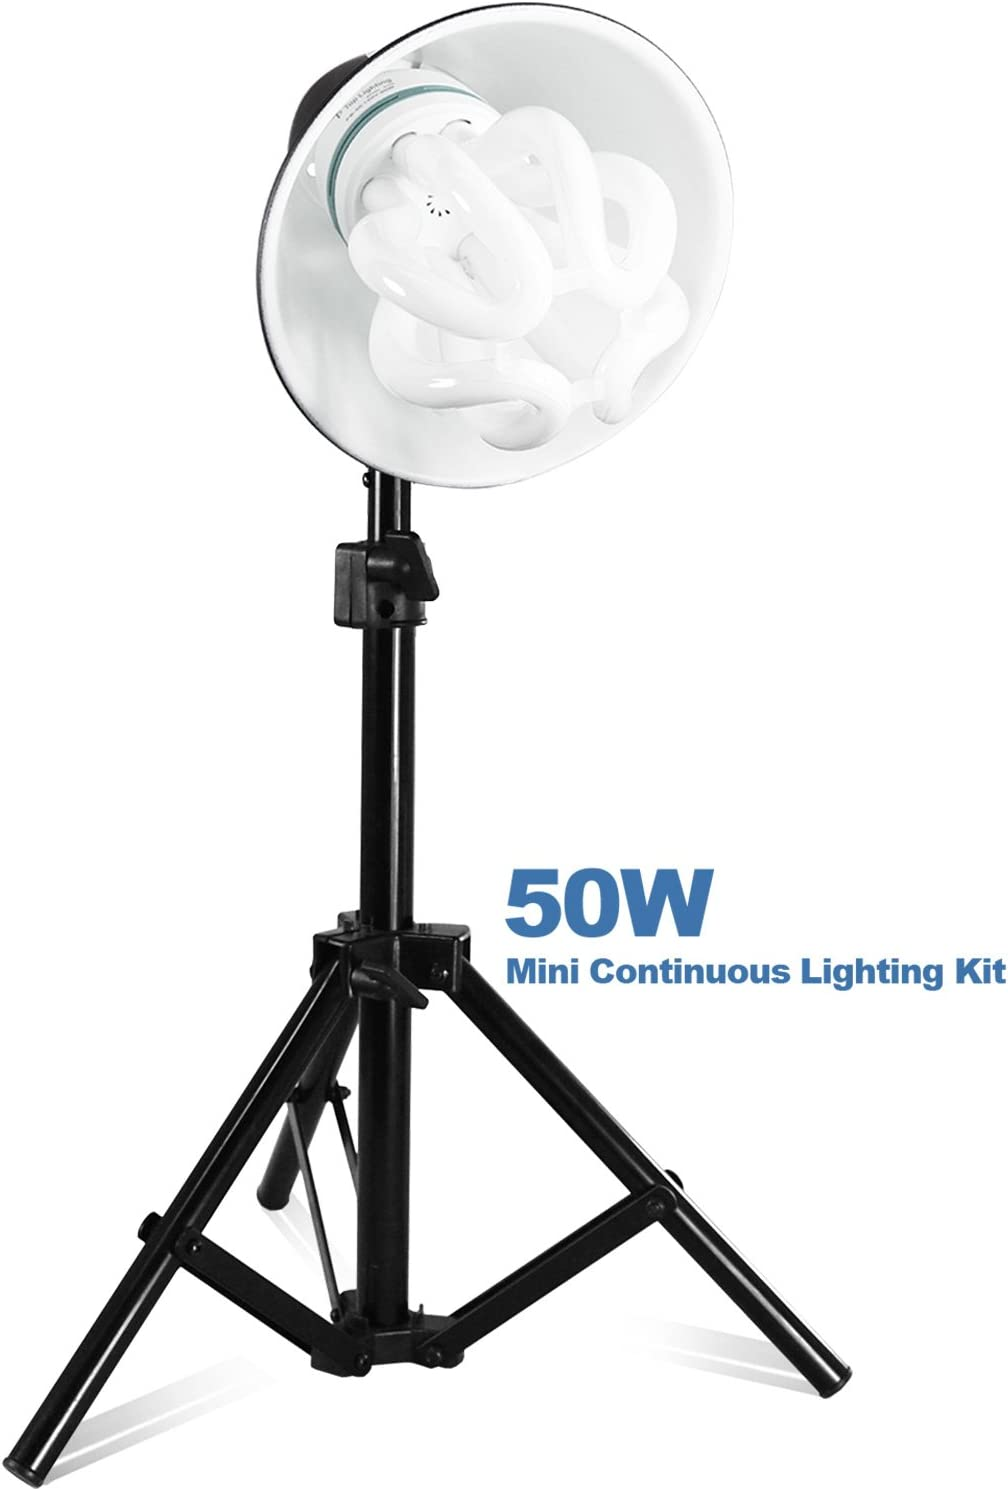 Julius Studio 50W Bright Beauty Dish Reflector Table Top Photo Studio Lighting Stand Kit PR20/_AM1